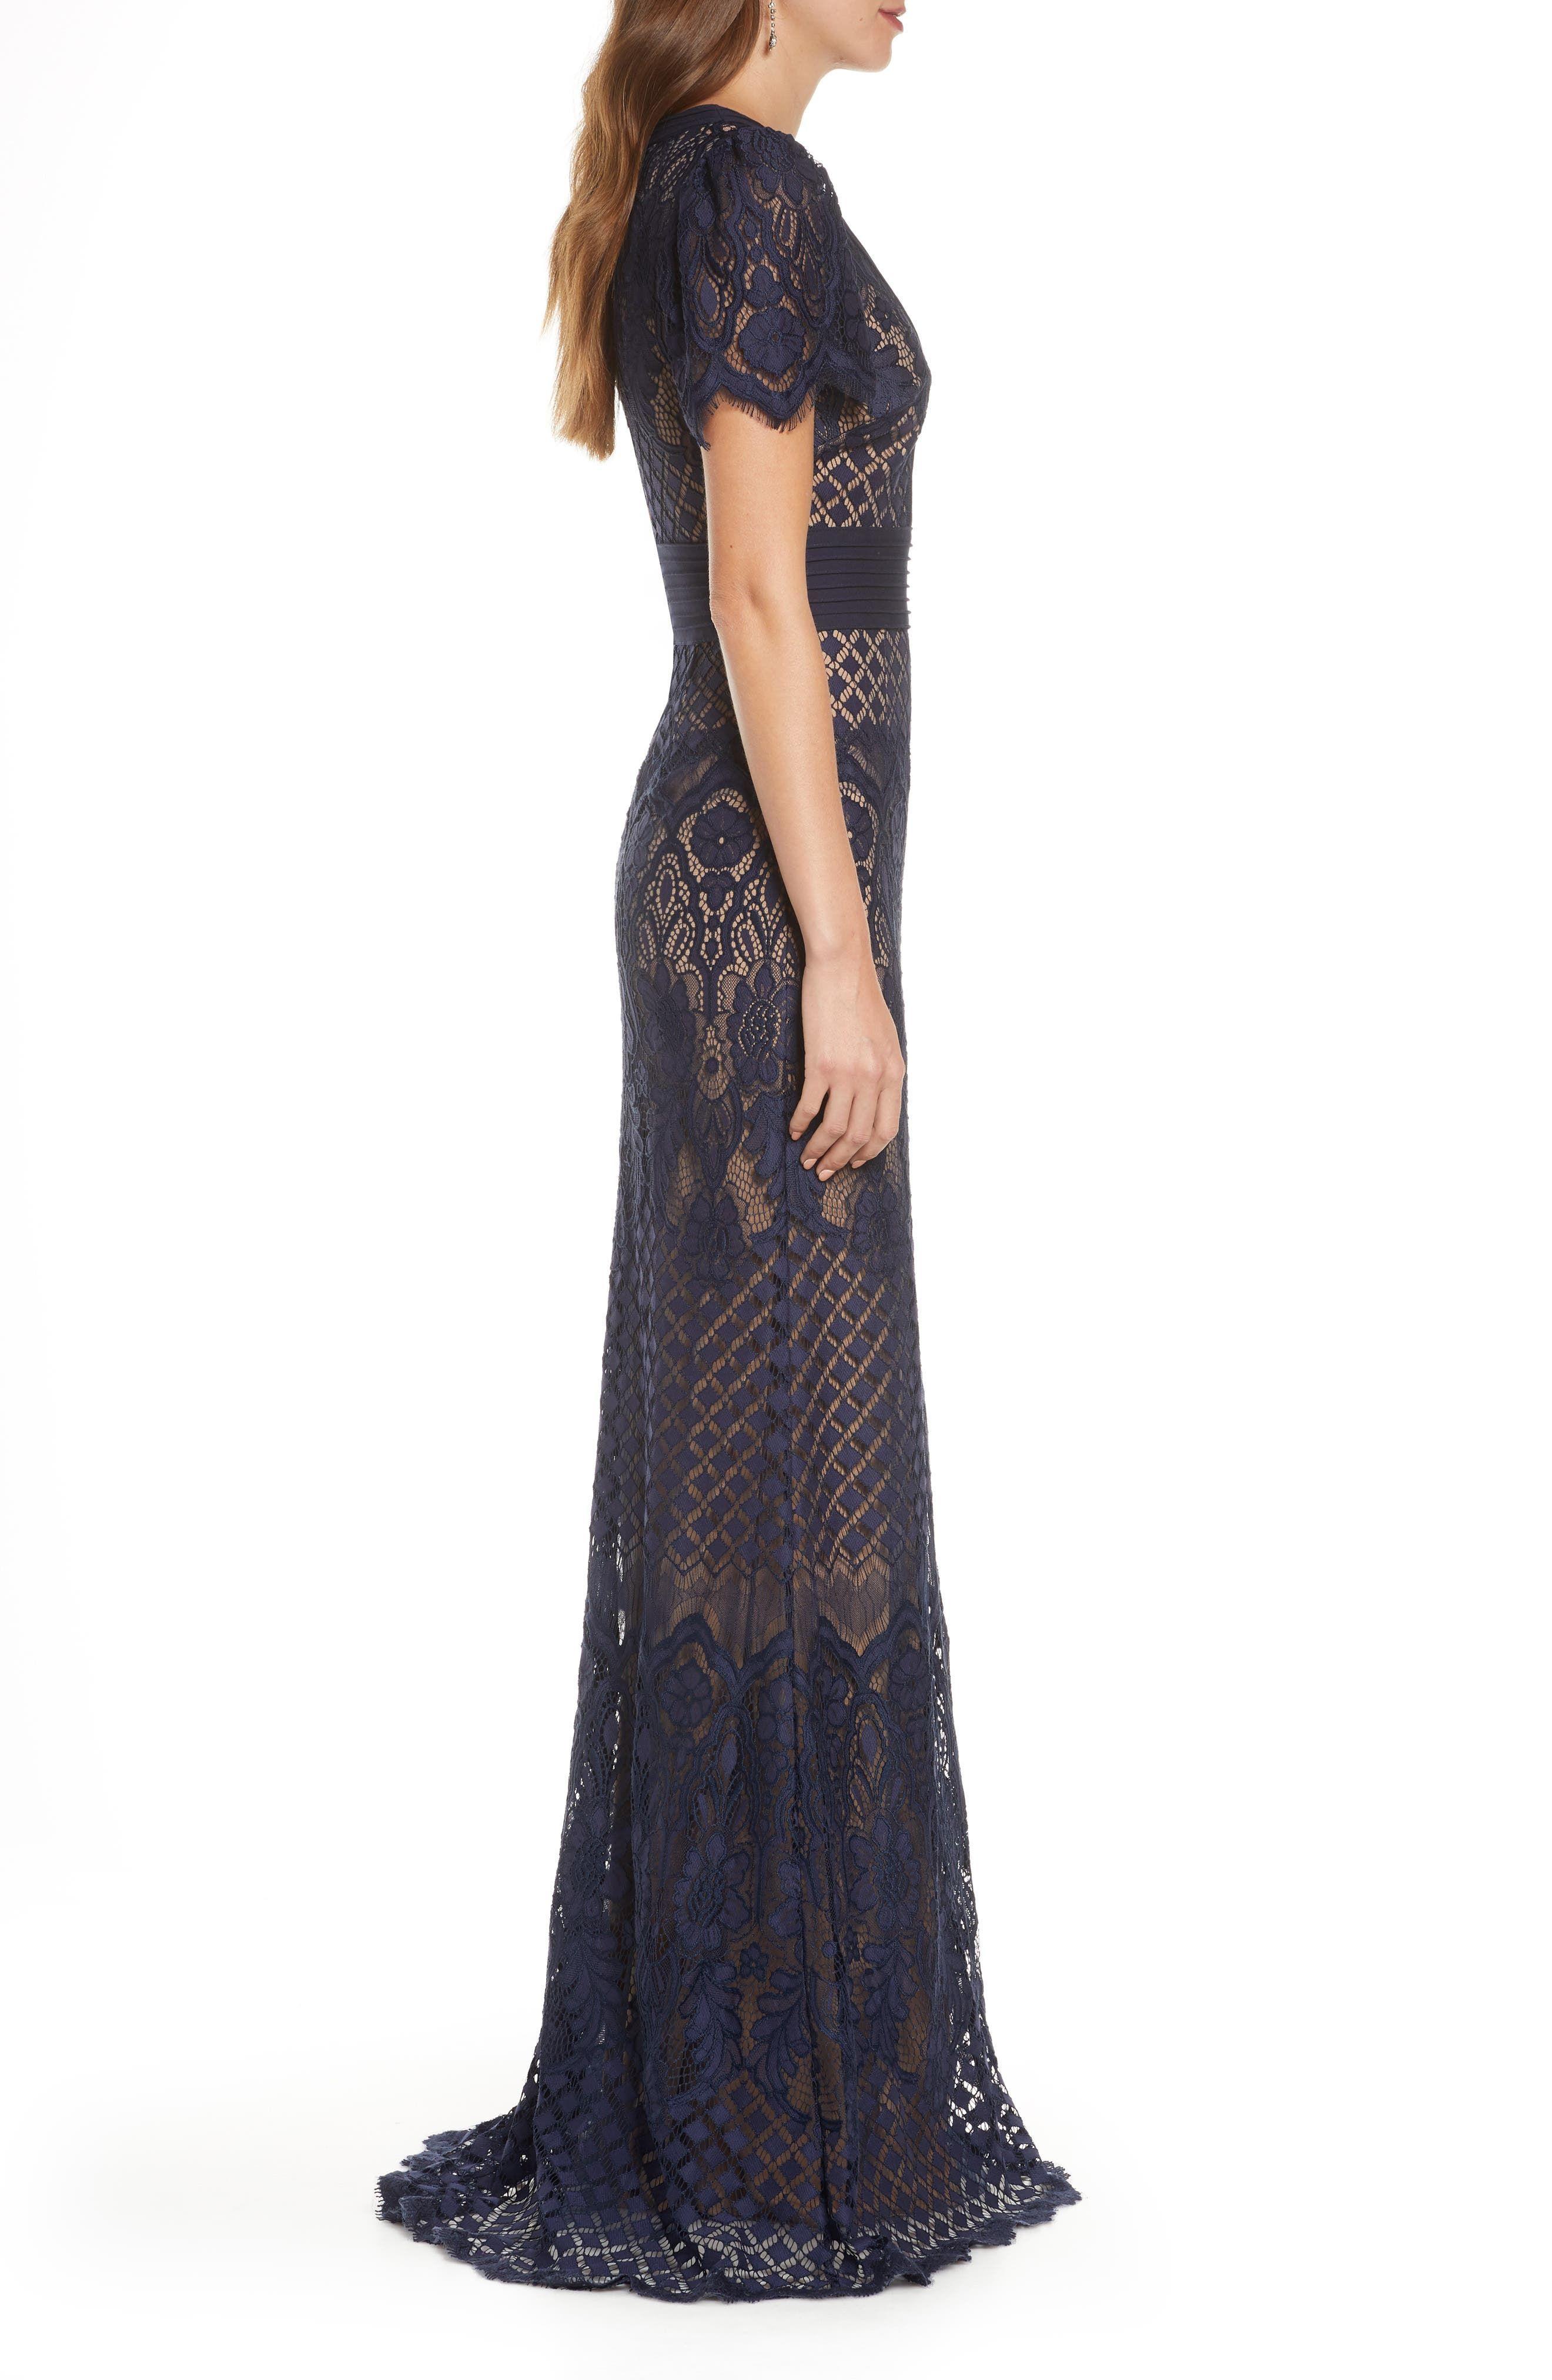 Tadashi Shoji Embroidered Lace Evening Gown Nordstrom In 2021 Evening Gowns Lace Evening Gowns Gowns [ 4048 x 2640 Pixel ]